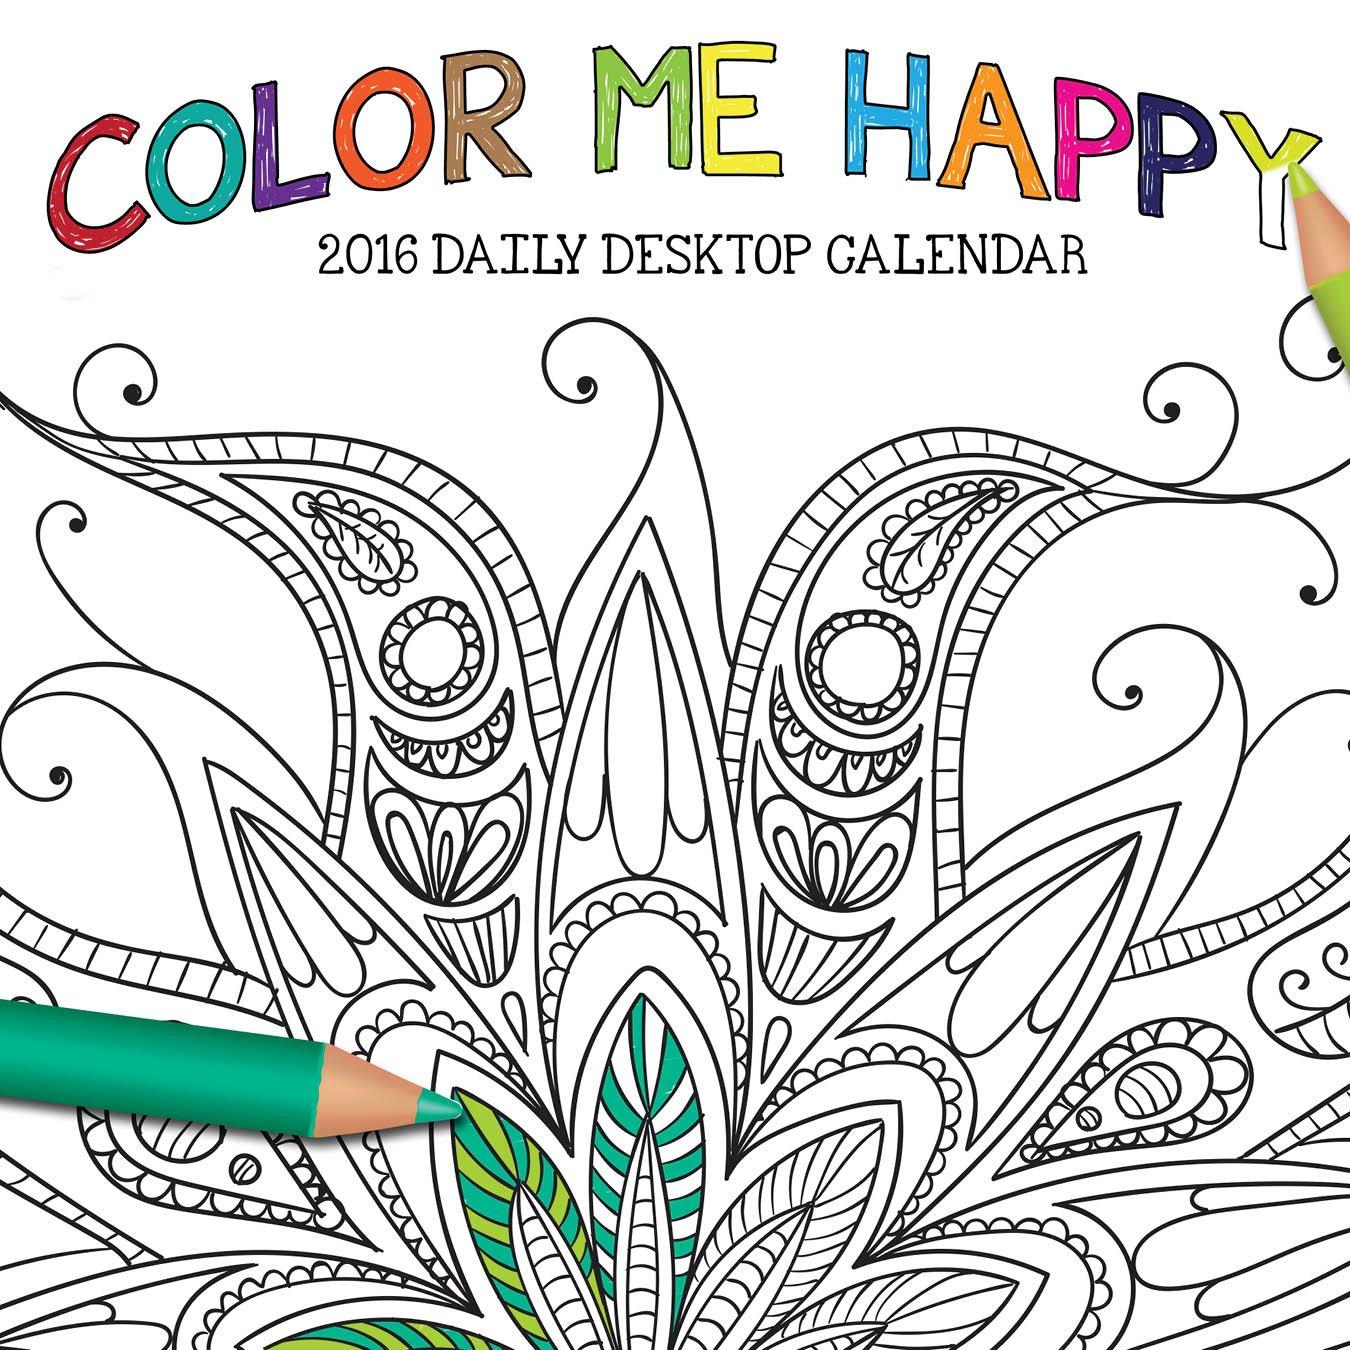 81sP6yA4zIL 2016 color me happy daily desktop box calendar tf publishing on 2016 2017 academic calendar template